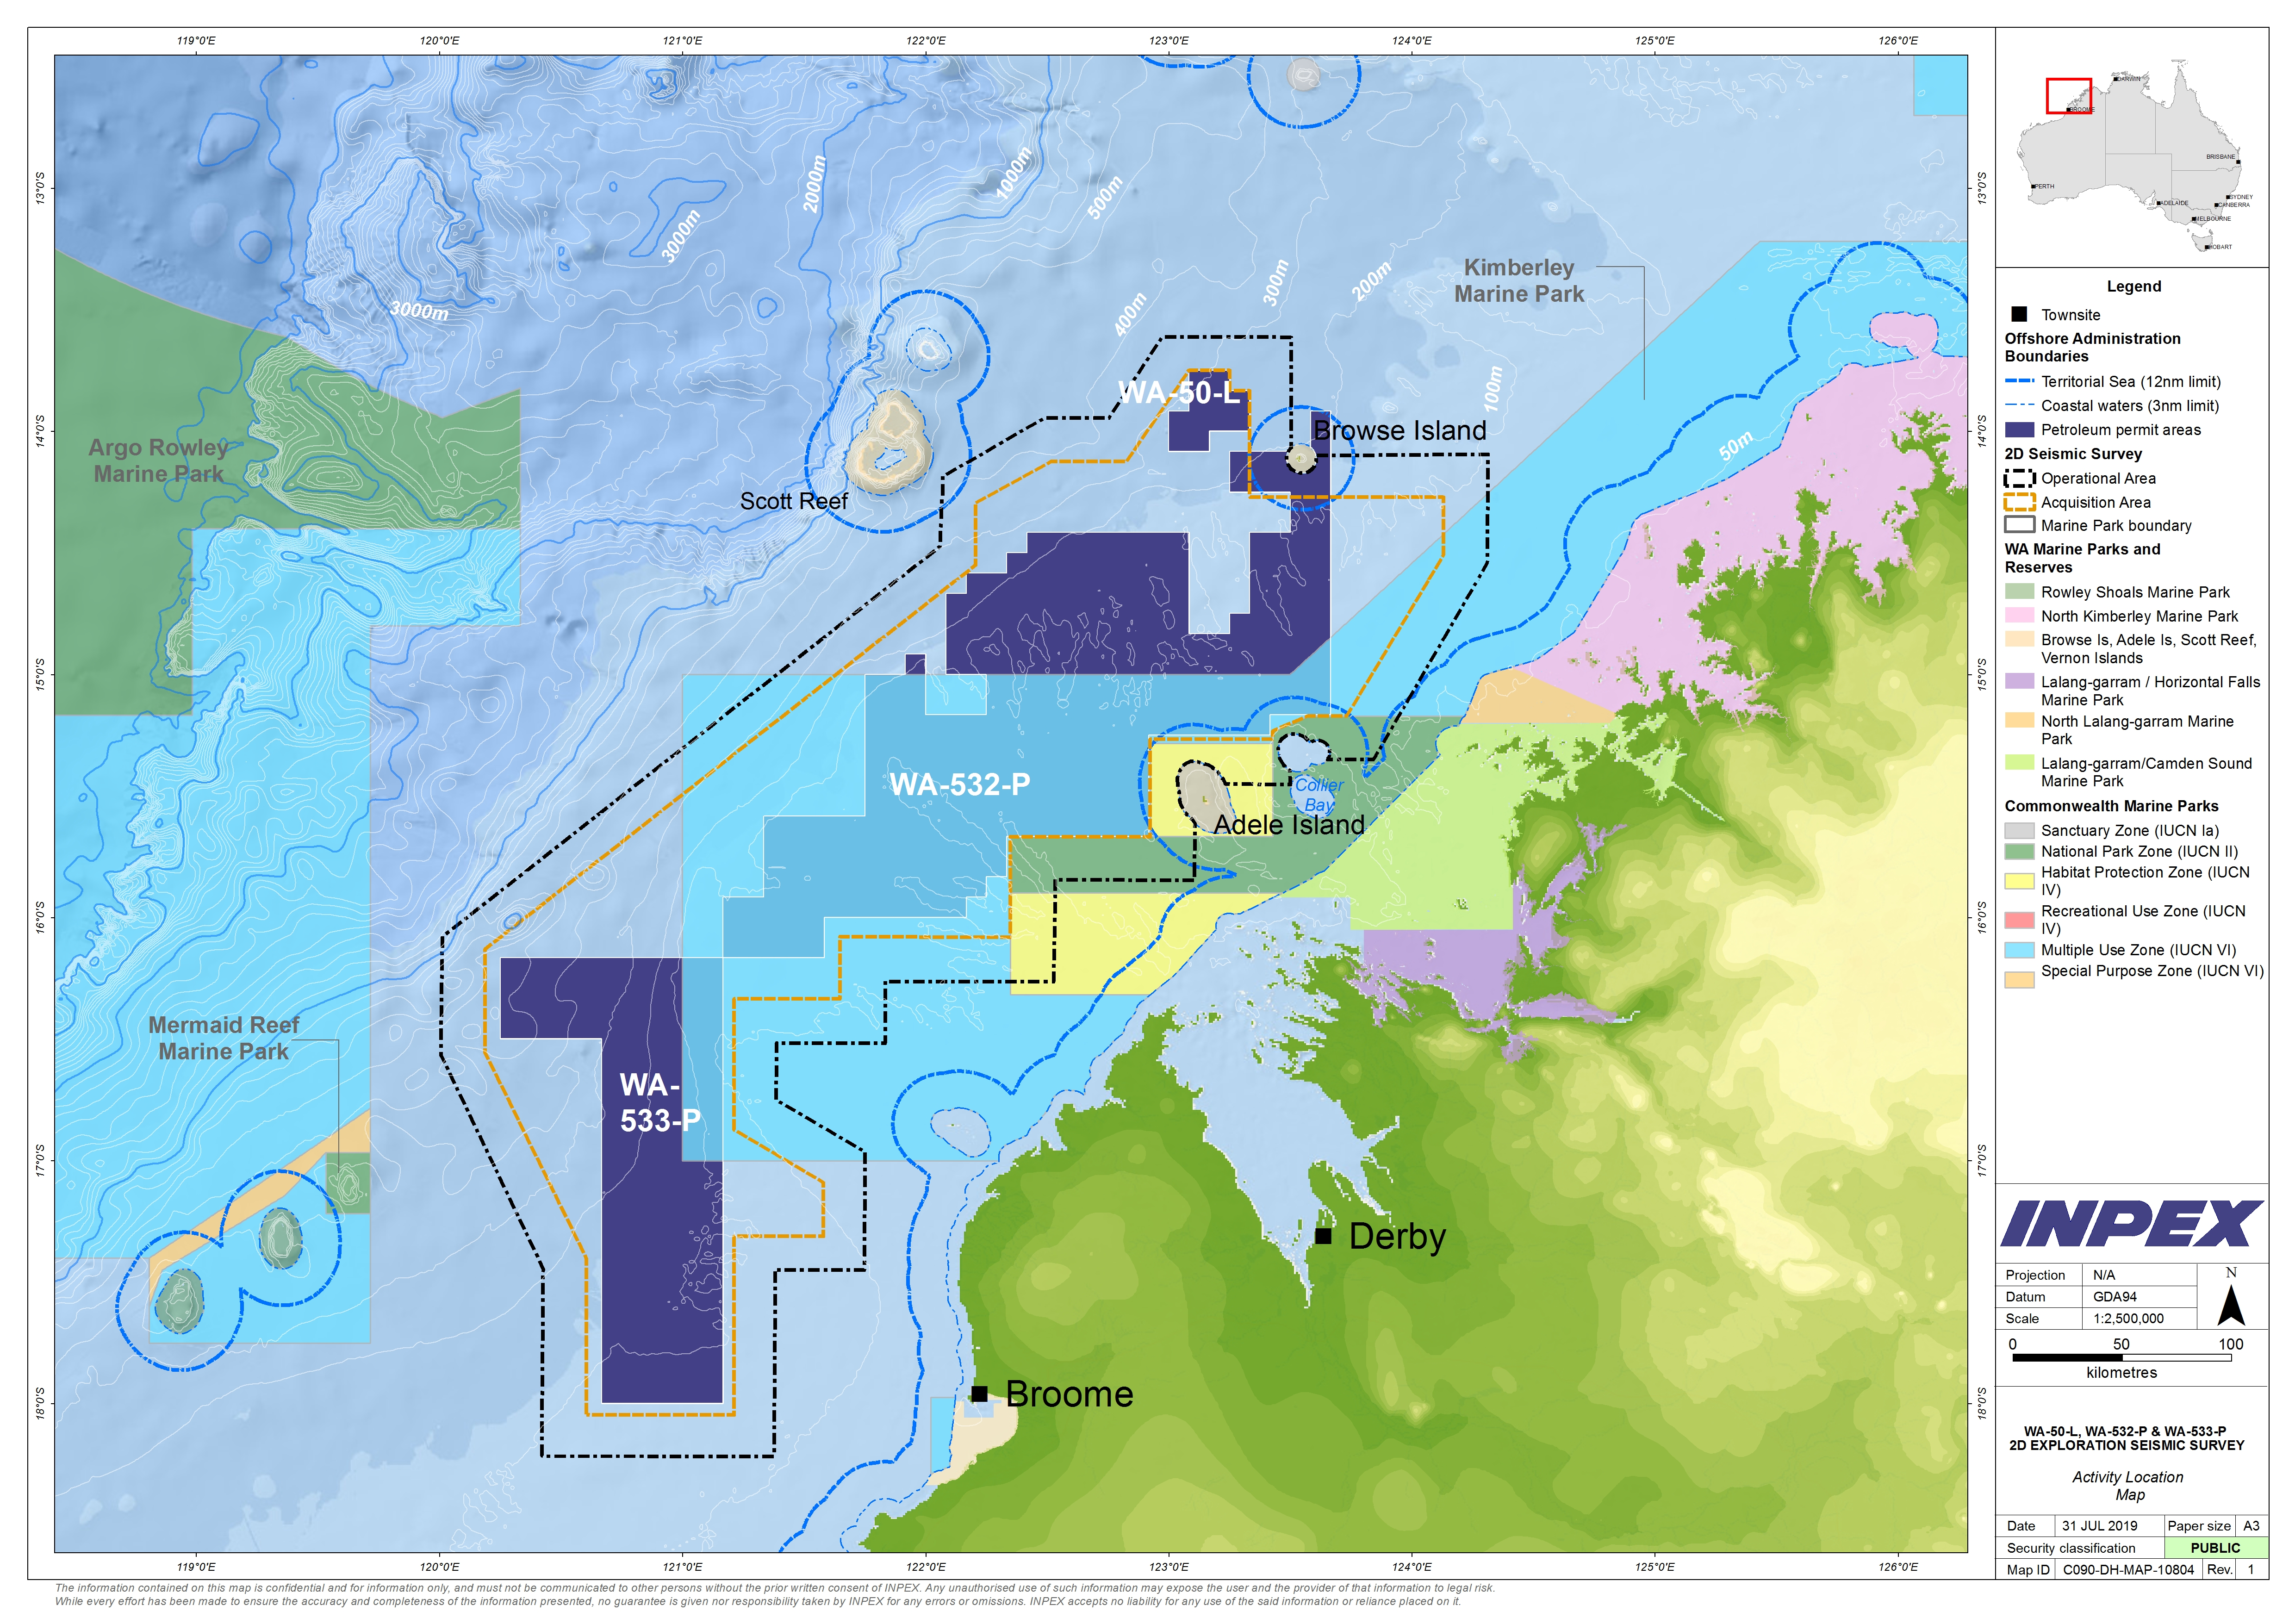 Location map - Activity: 2D Seismic Survey WA-532-P, WA-533-P and WA-50-L (refer to description)